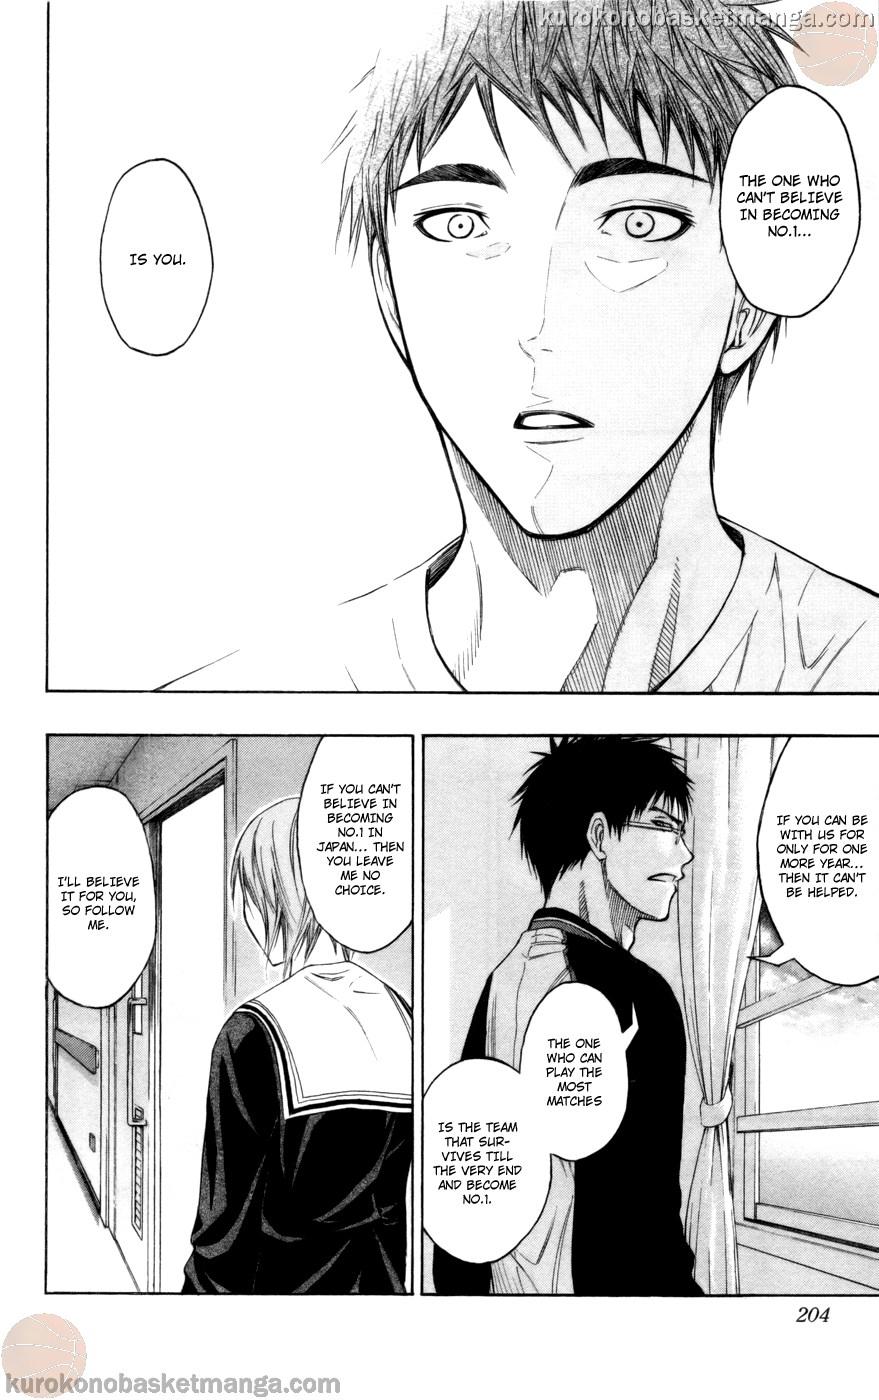 Kuroko no Basket Manga Chapter 99 - Image 19